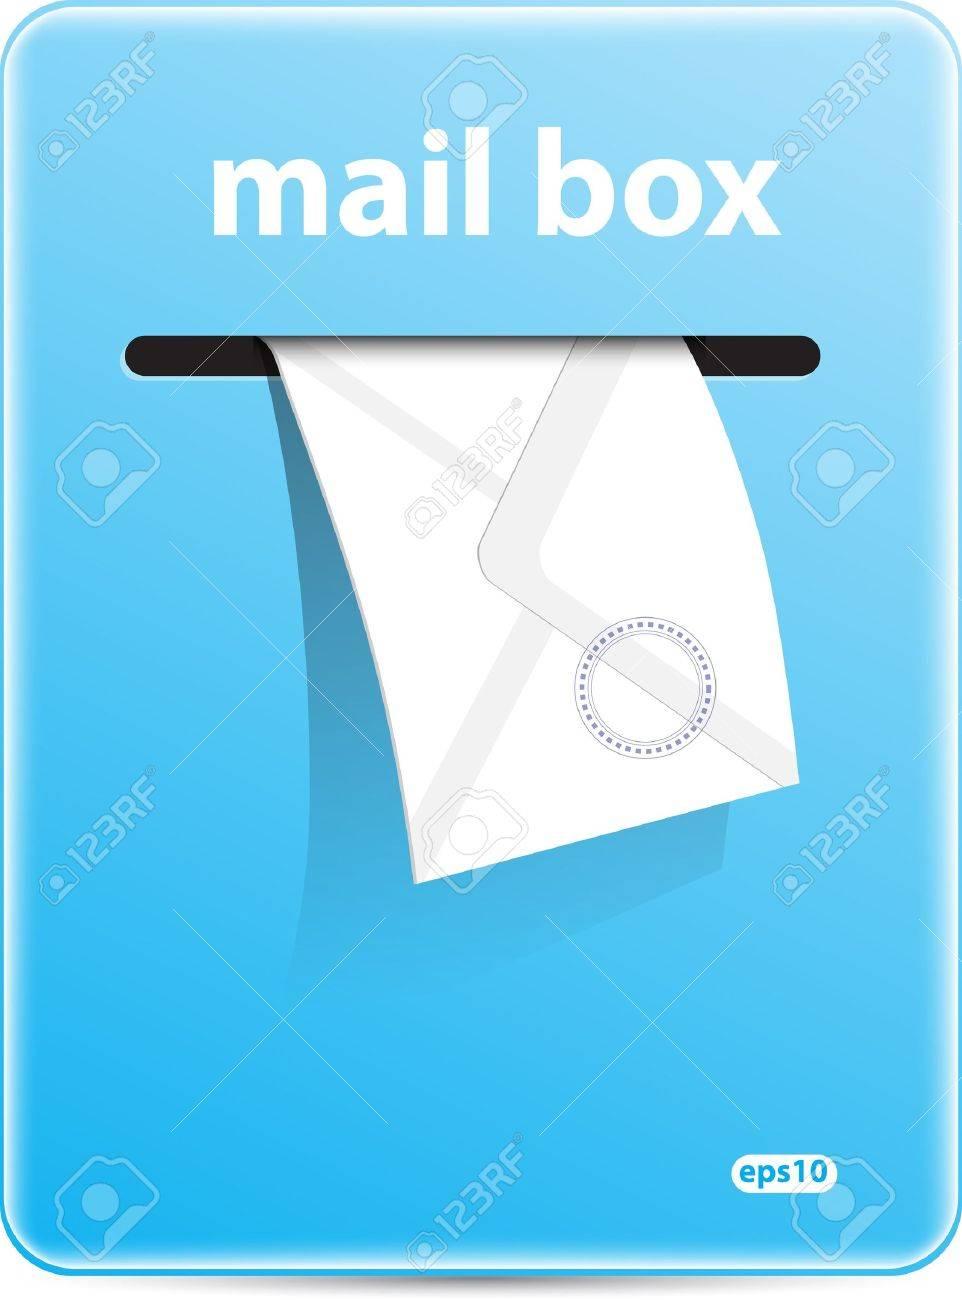 Mail box vector format Stock Vector - 11618289